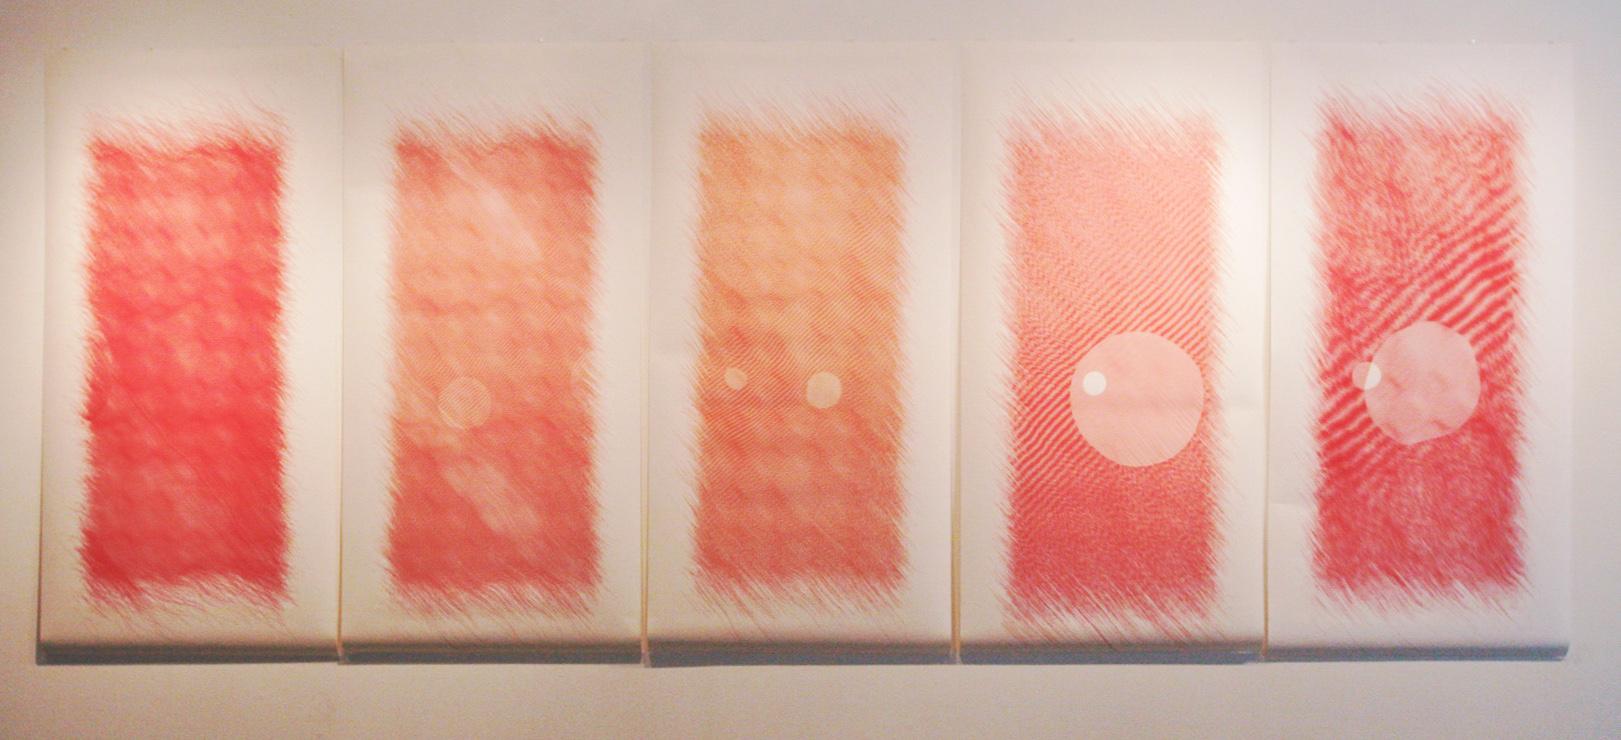 "Bright Wavelets    Ink on paper - pen plotter drawing    Art : 76""x190"" total (5 panels 76""x38"" each)    Paper : Torinoko"